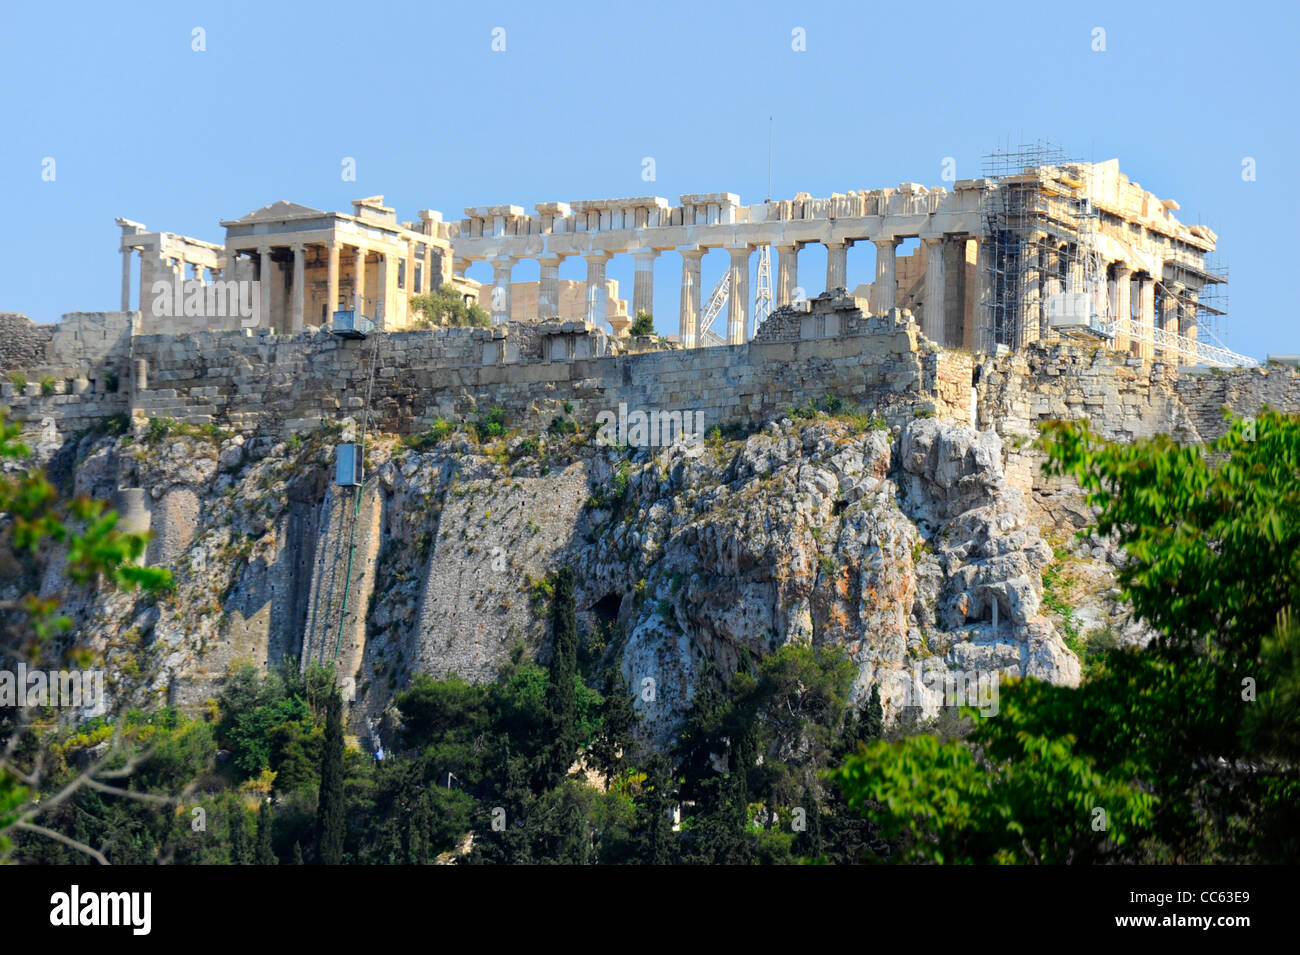 El Partenón, Acrópolis Atenas Grecia Kallikrates Iktinos Athena Imagen De Stock